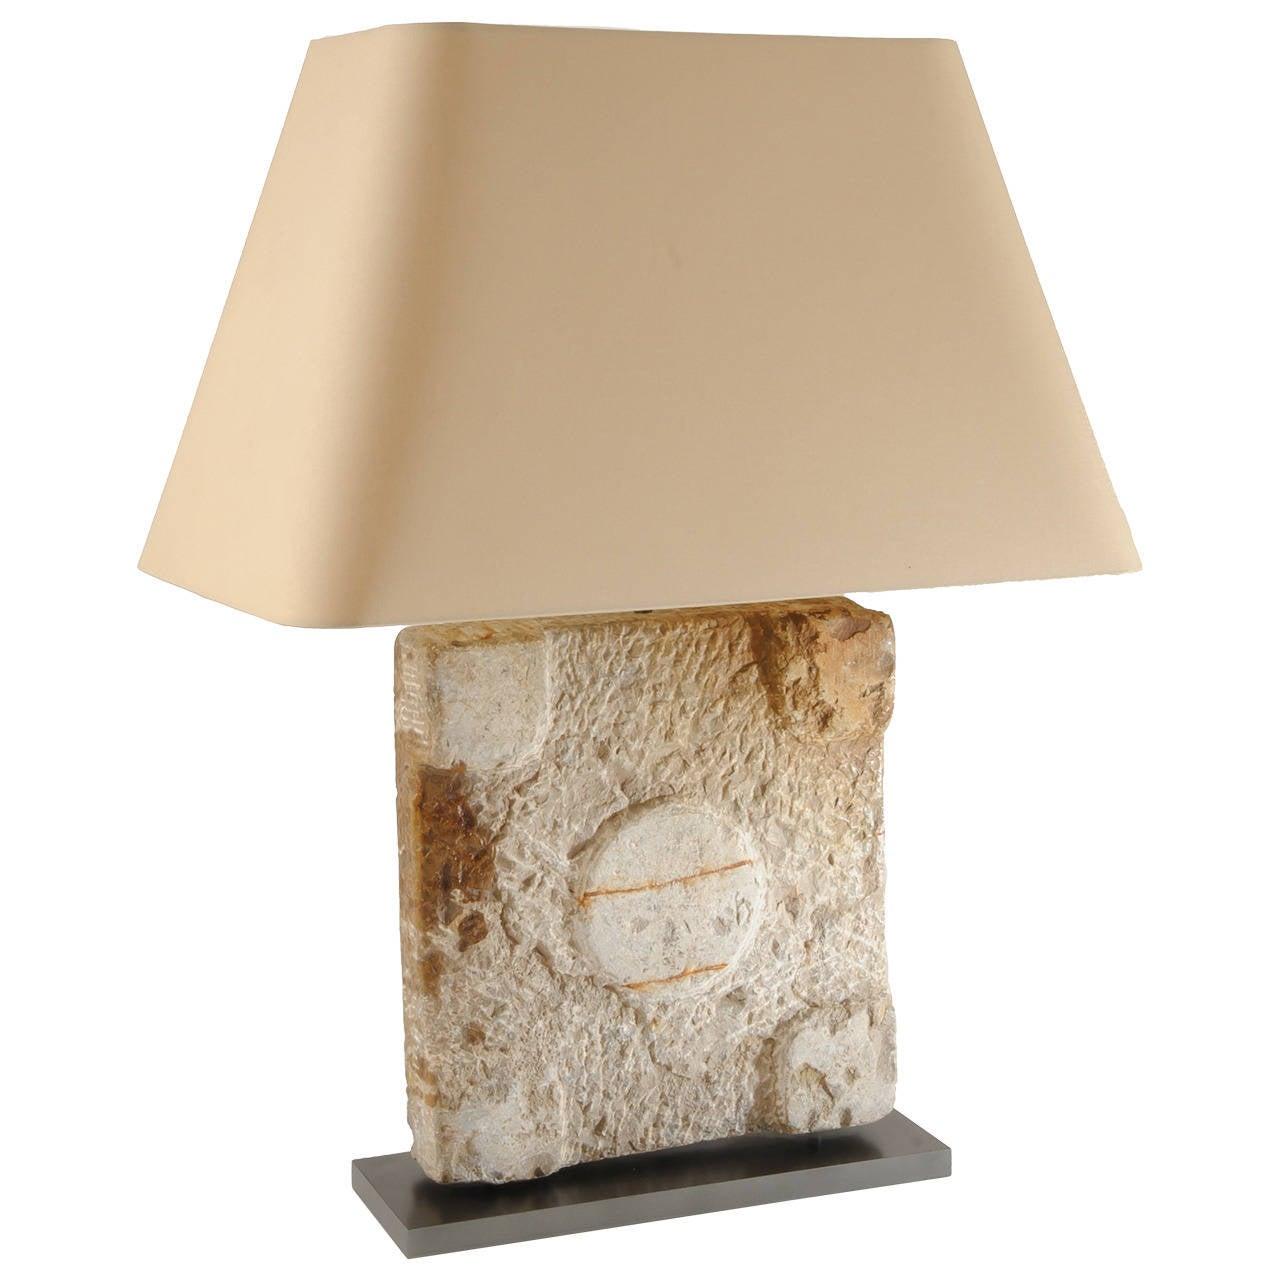 Stone Architectural Element Roman Column Base Lamp For